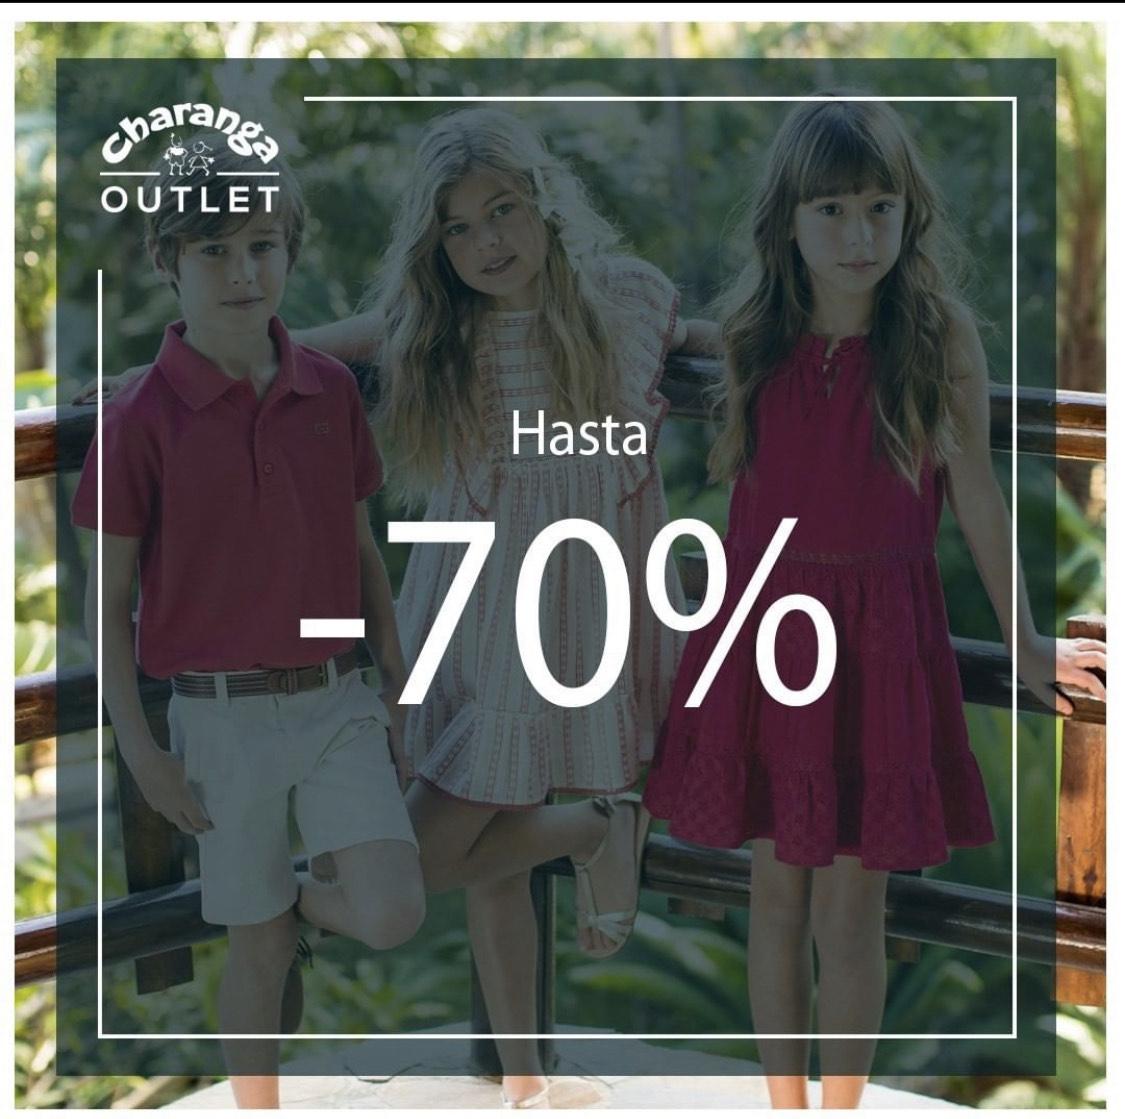 Charanga Outlet hasta el 70% de descuento